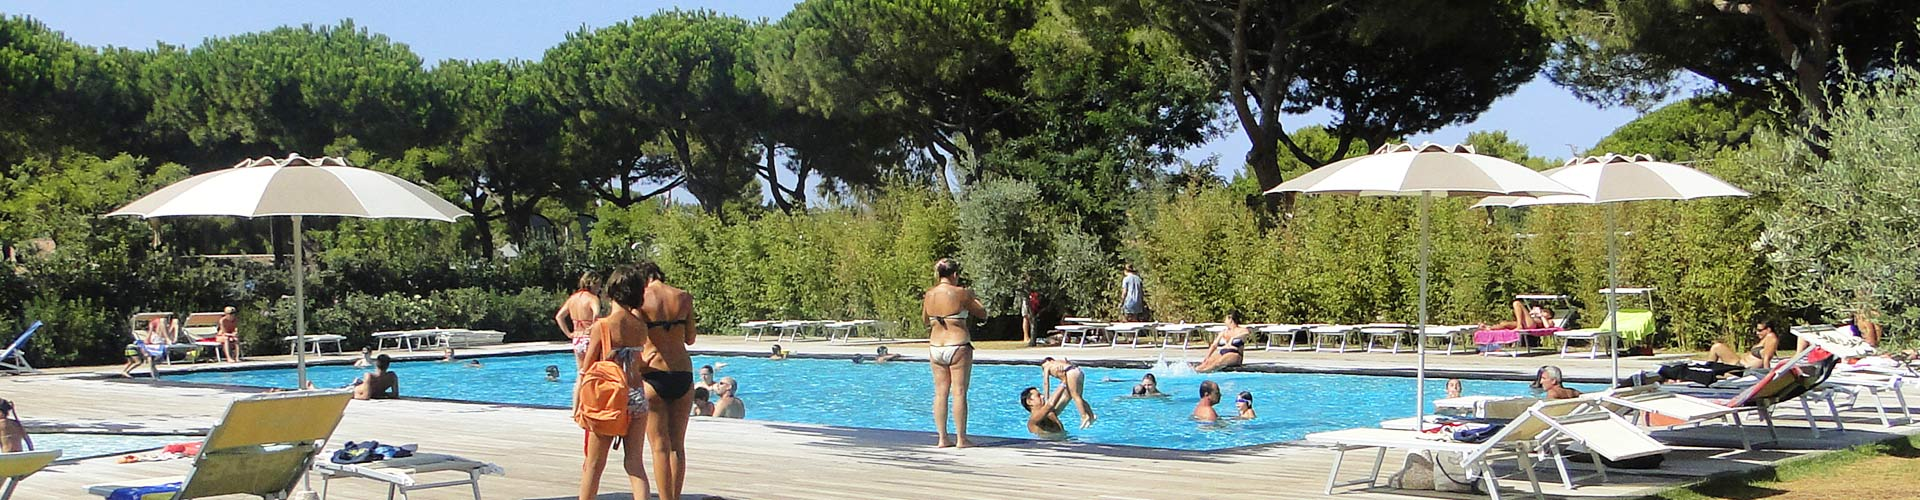 Camping sardaigne bord de mer avec piscine for Camping embrun avec piscine